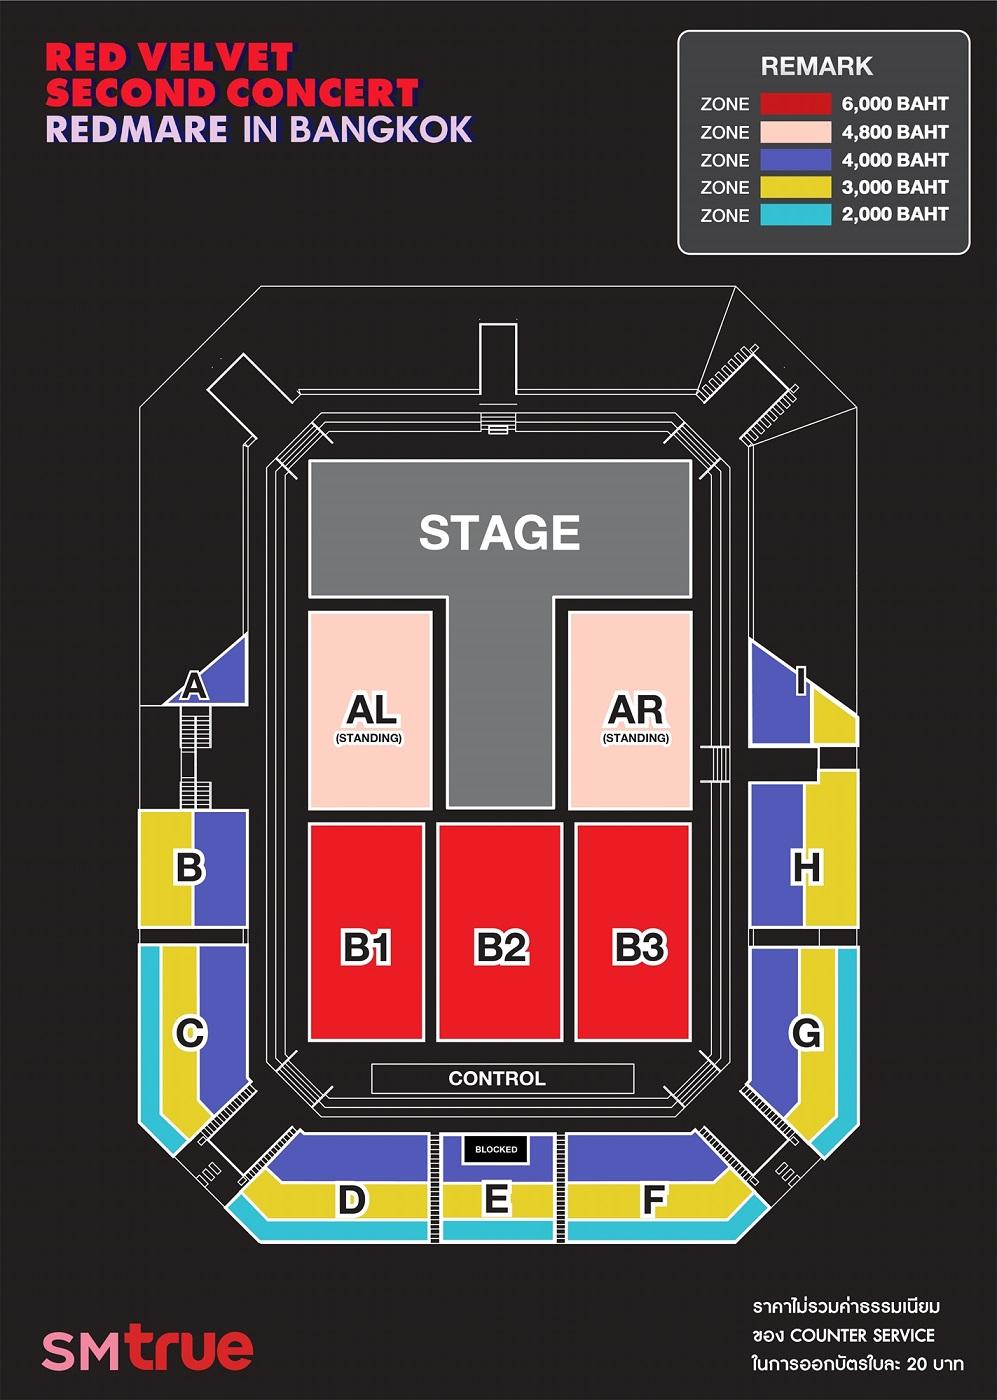 [Official Seat Plan] Red Velvet 2nd Concert [REDMARE] in BANGKOK